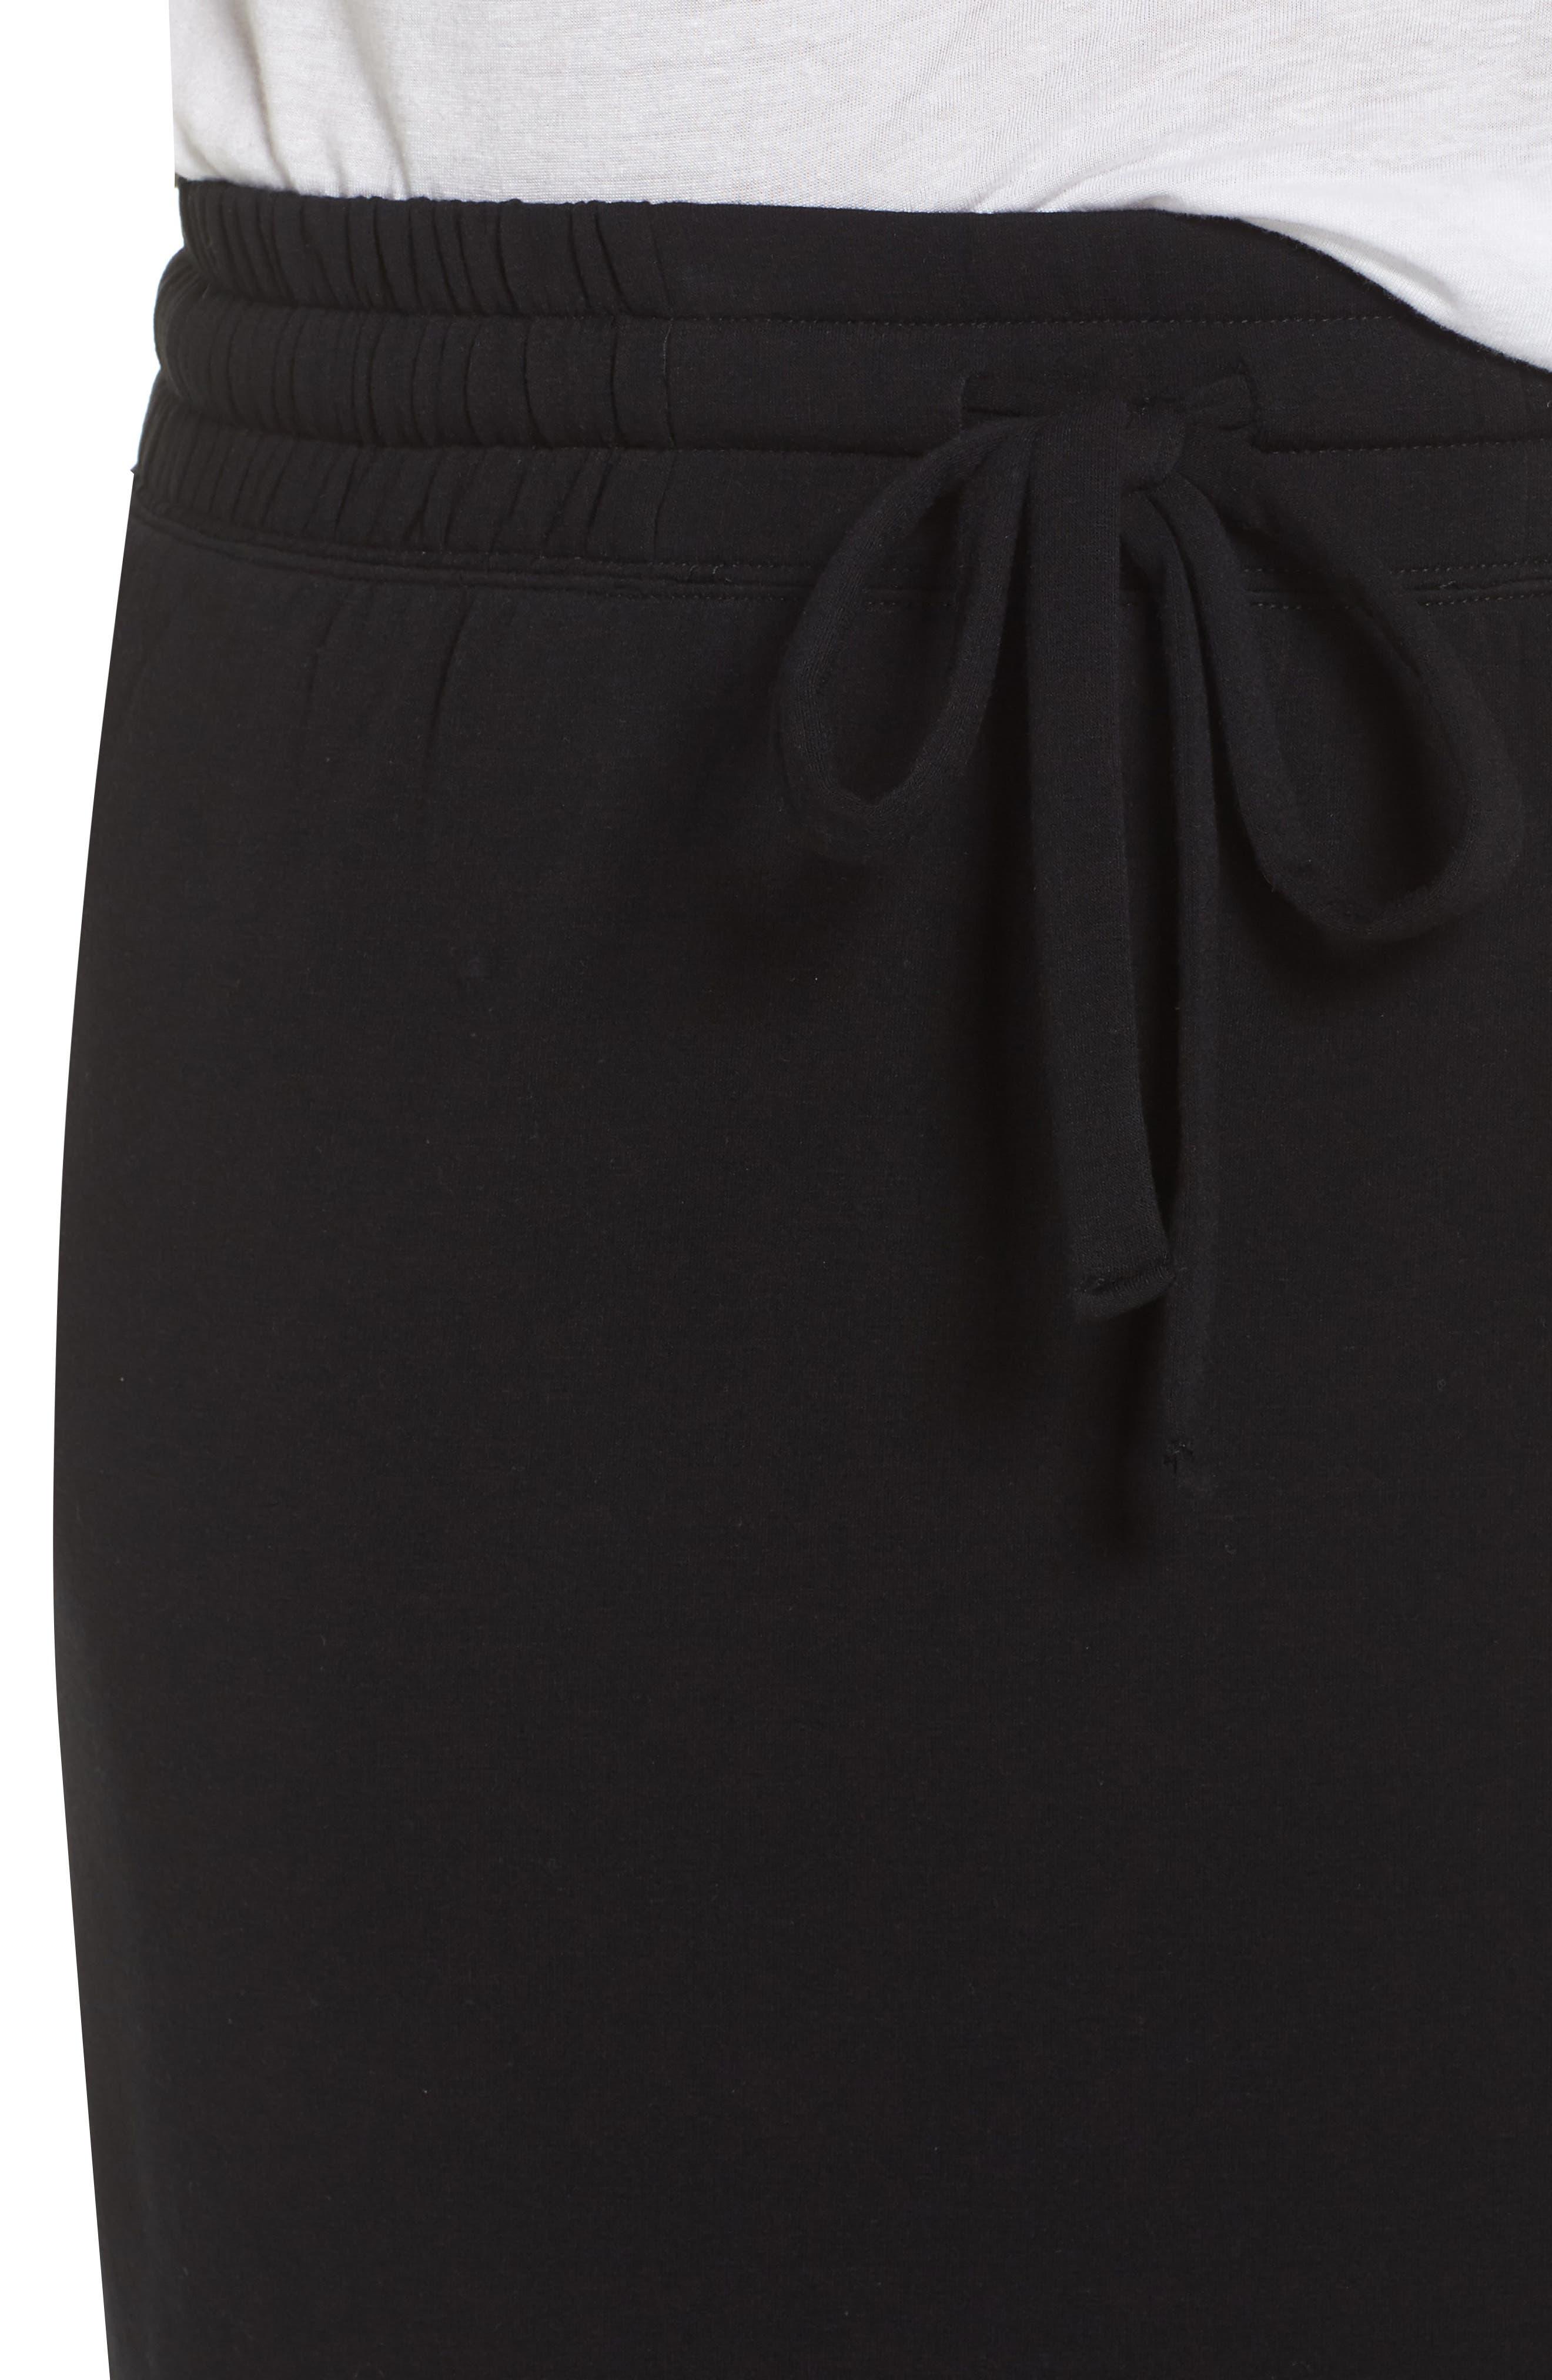 Off-Duty Tie Waist Miniskirt,                             Alternate thumbnail 4, color,                             001